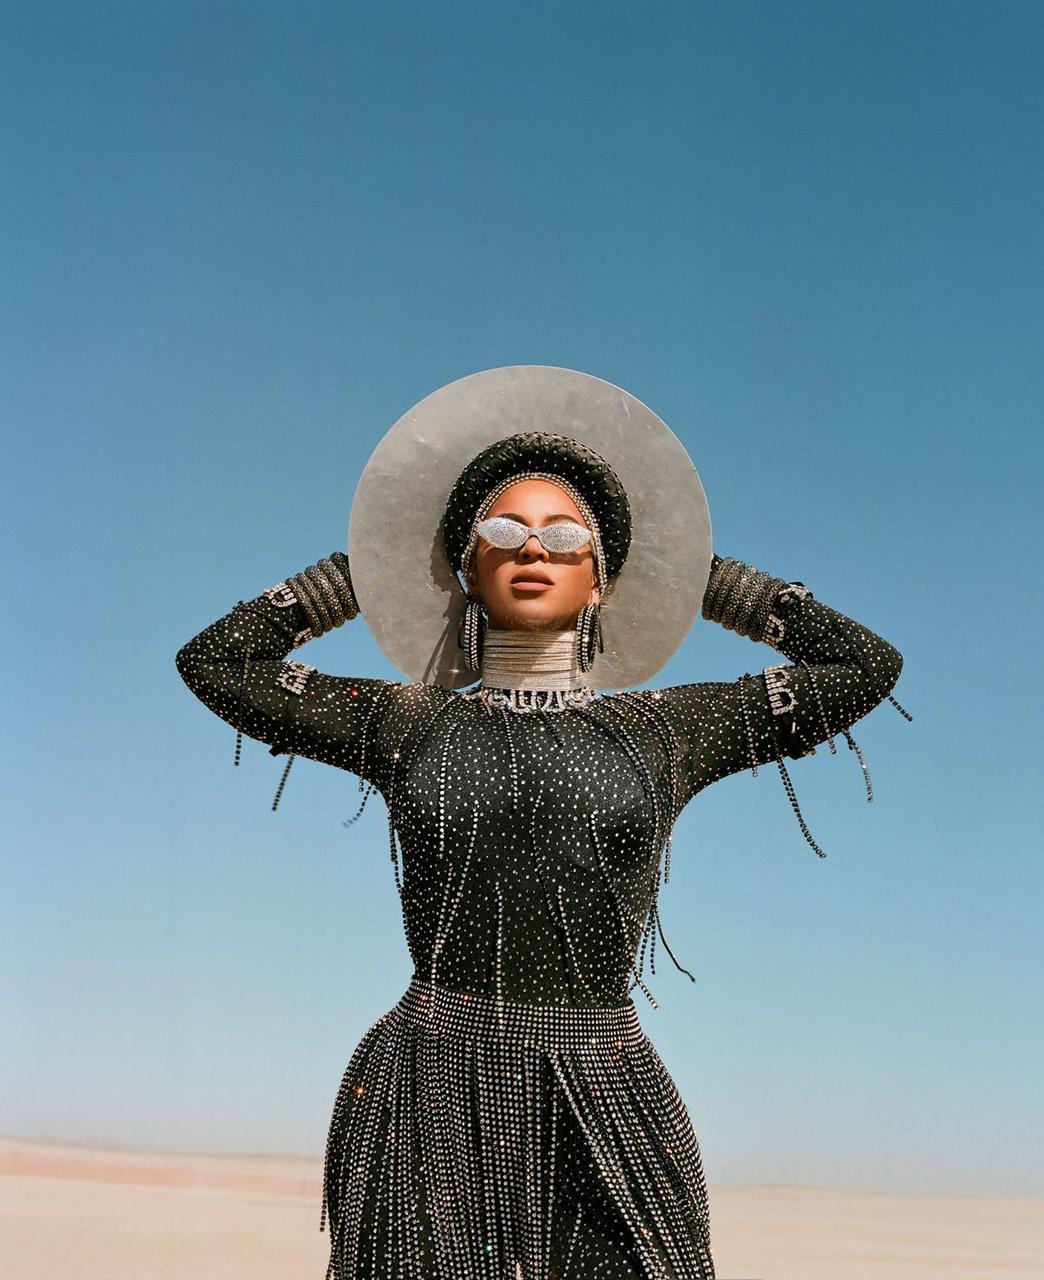 beyonce.com-disney-black-is-king-find-your-way-back-bodysuit-skirt-d-bleu.dazzled-headpiece-hoop-earrings-sunglasses-a-morir-diamond-choker-area